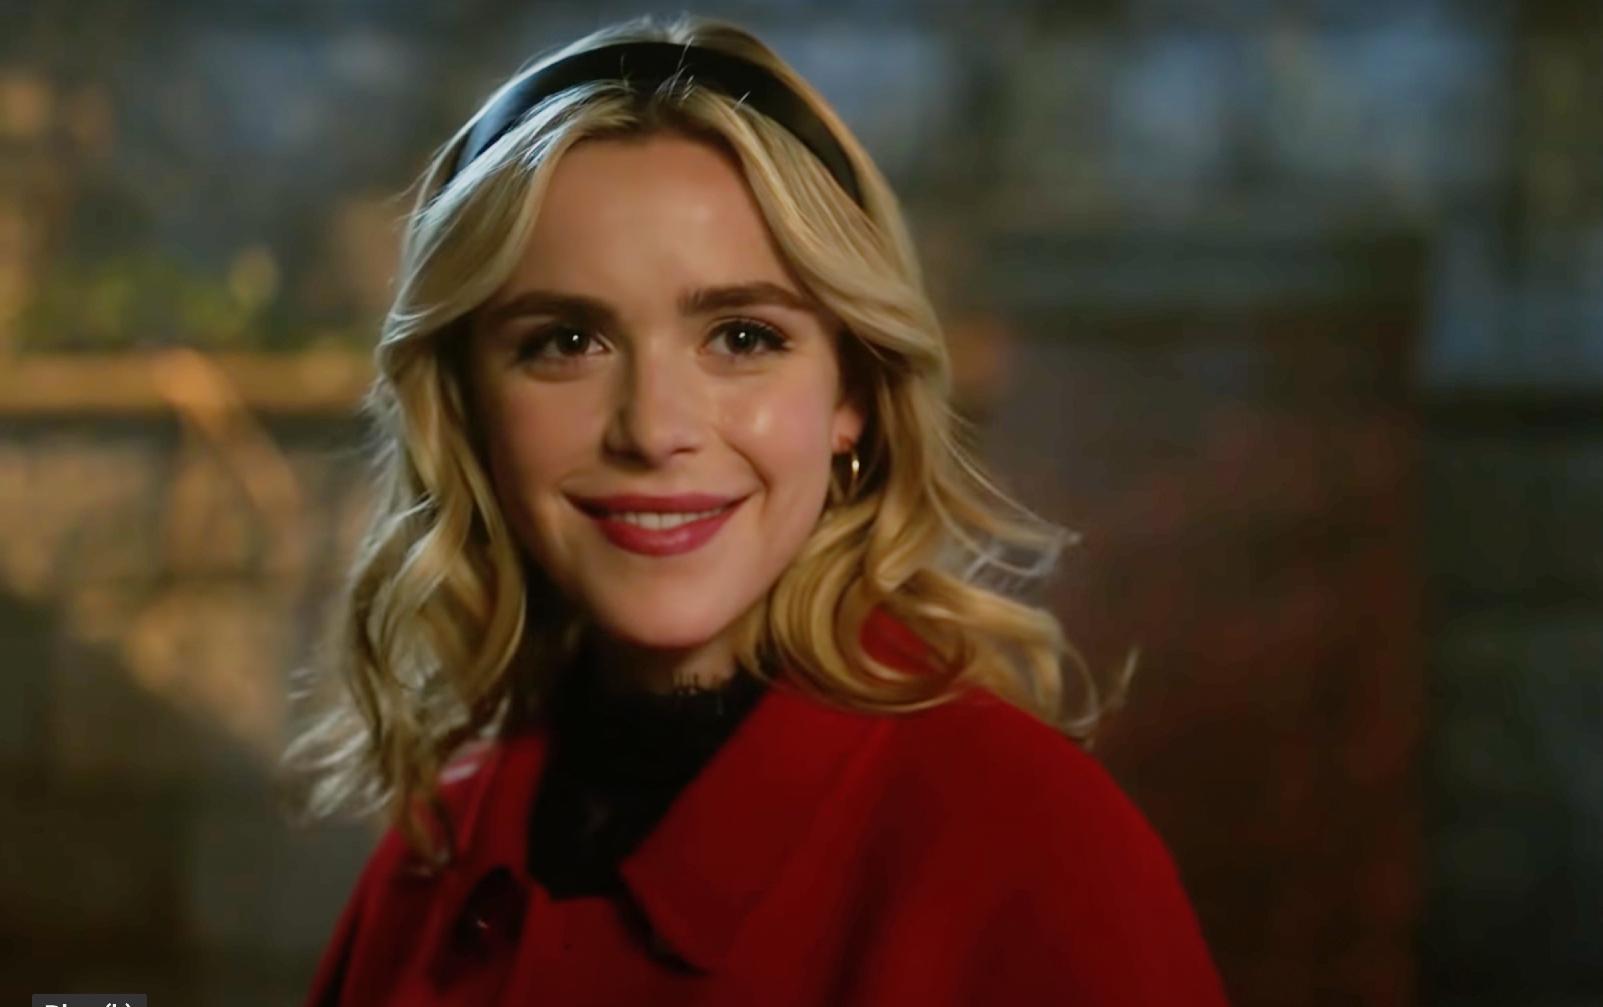 Kiernan Shipka as Sabrina Spellman in Riverdale's sixth season